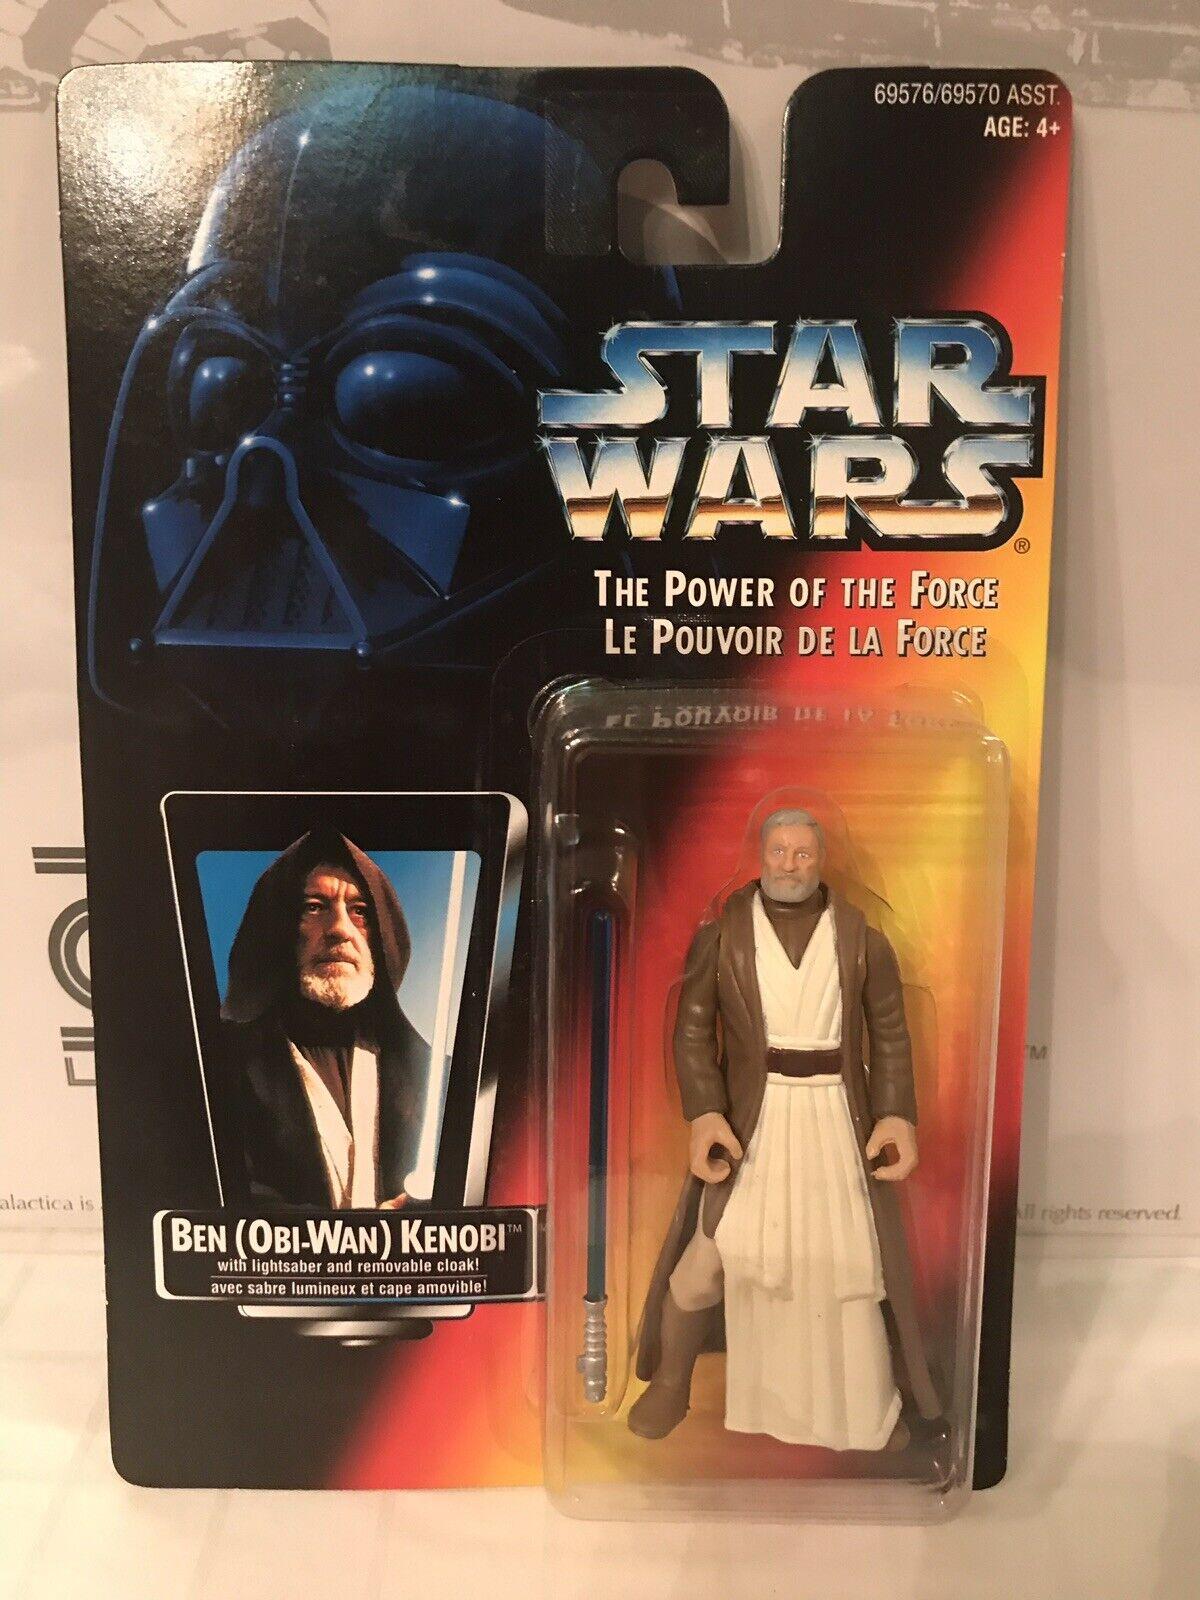 Star Wars The Power Of The Force Ben (Obi-Wan) Kenobi French Canadian